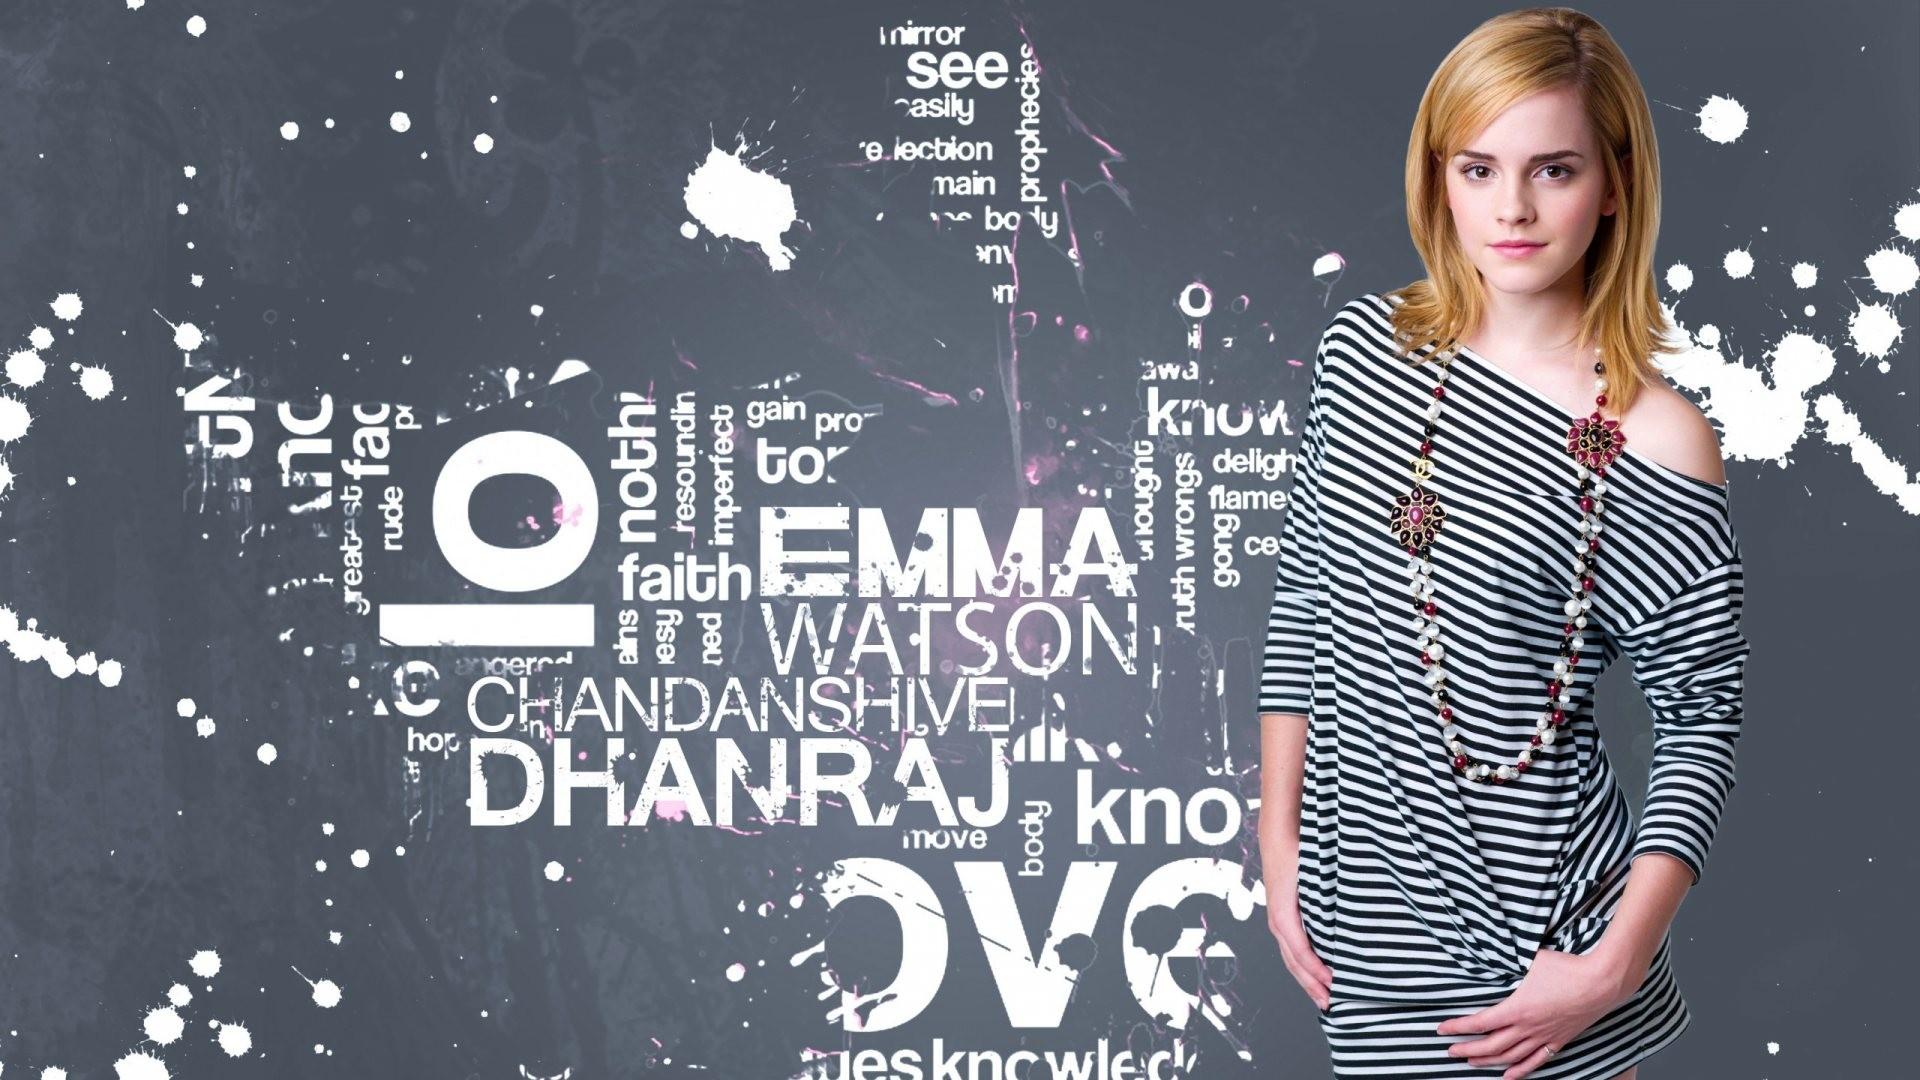 emma watson ultra hd wallpapers Backgrounds 1080p 2017